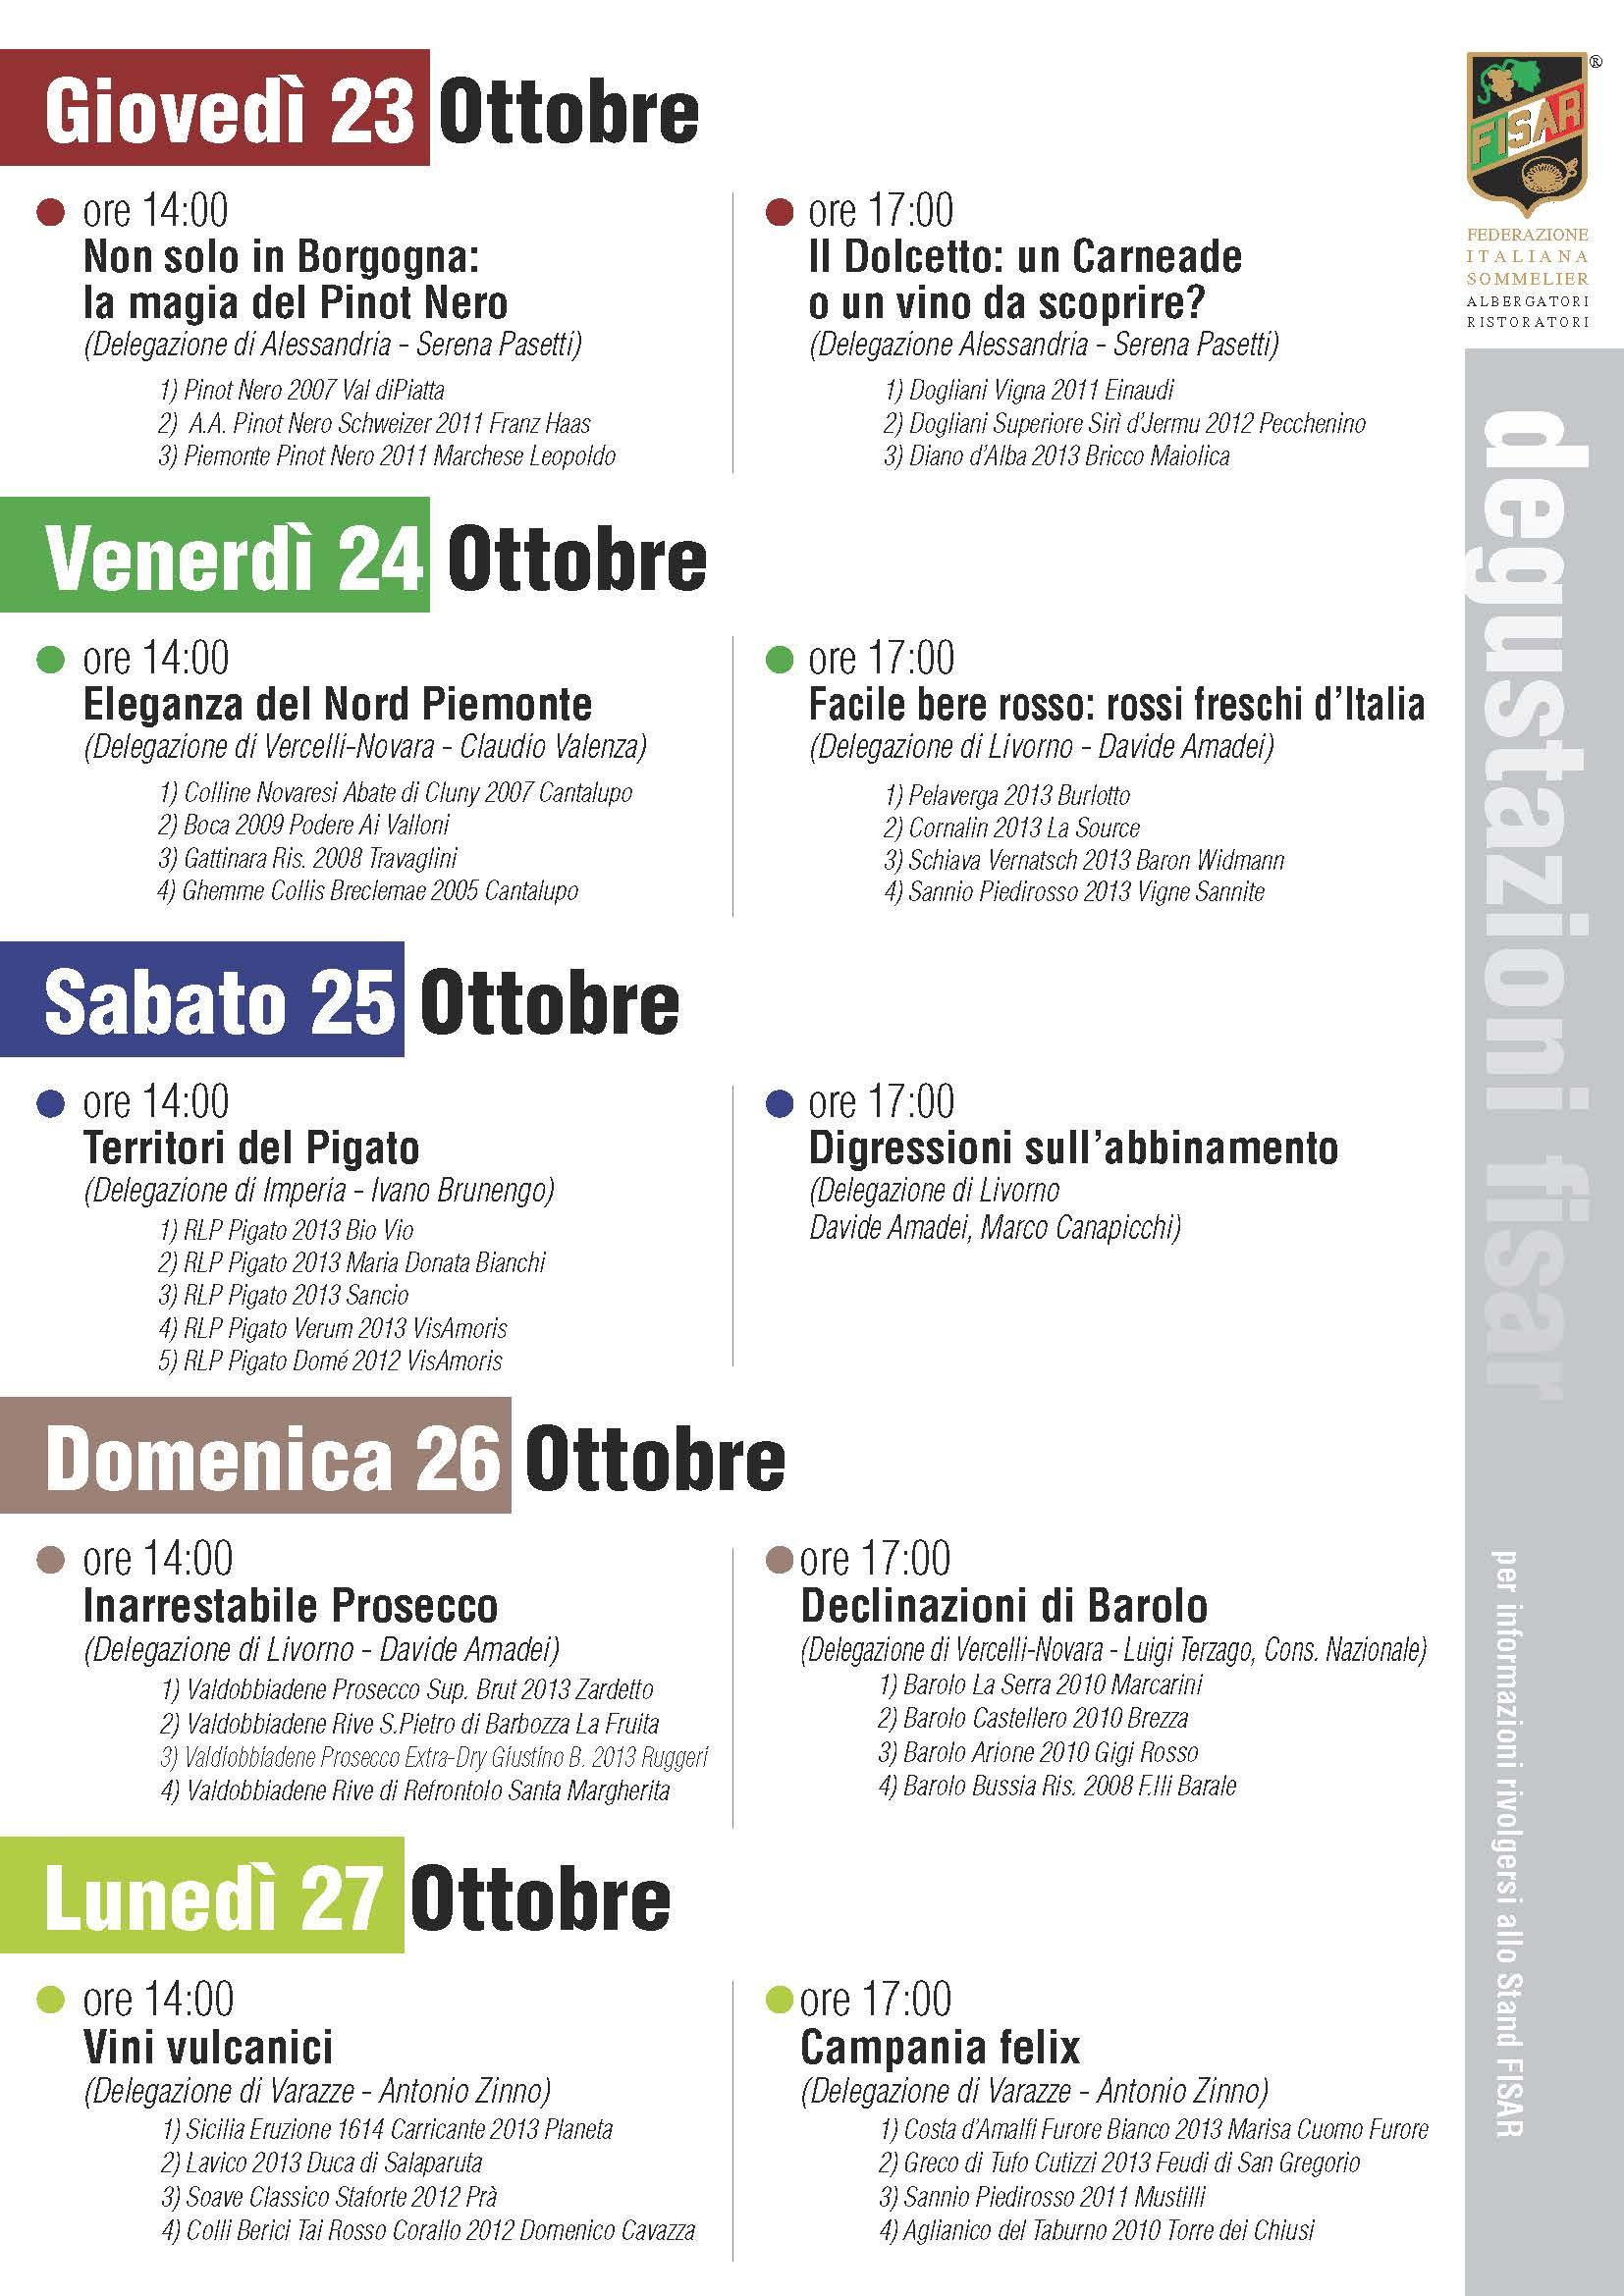 Volantino-FISAR-slow-food-eventi_02